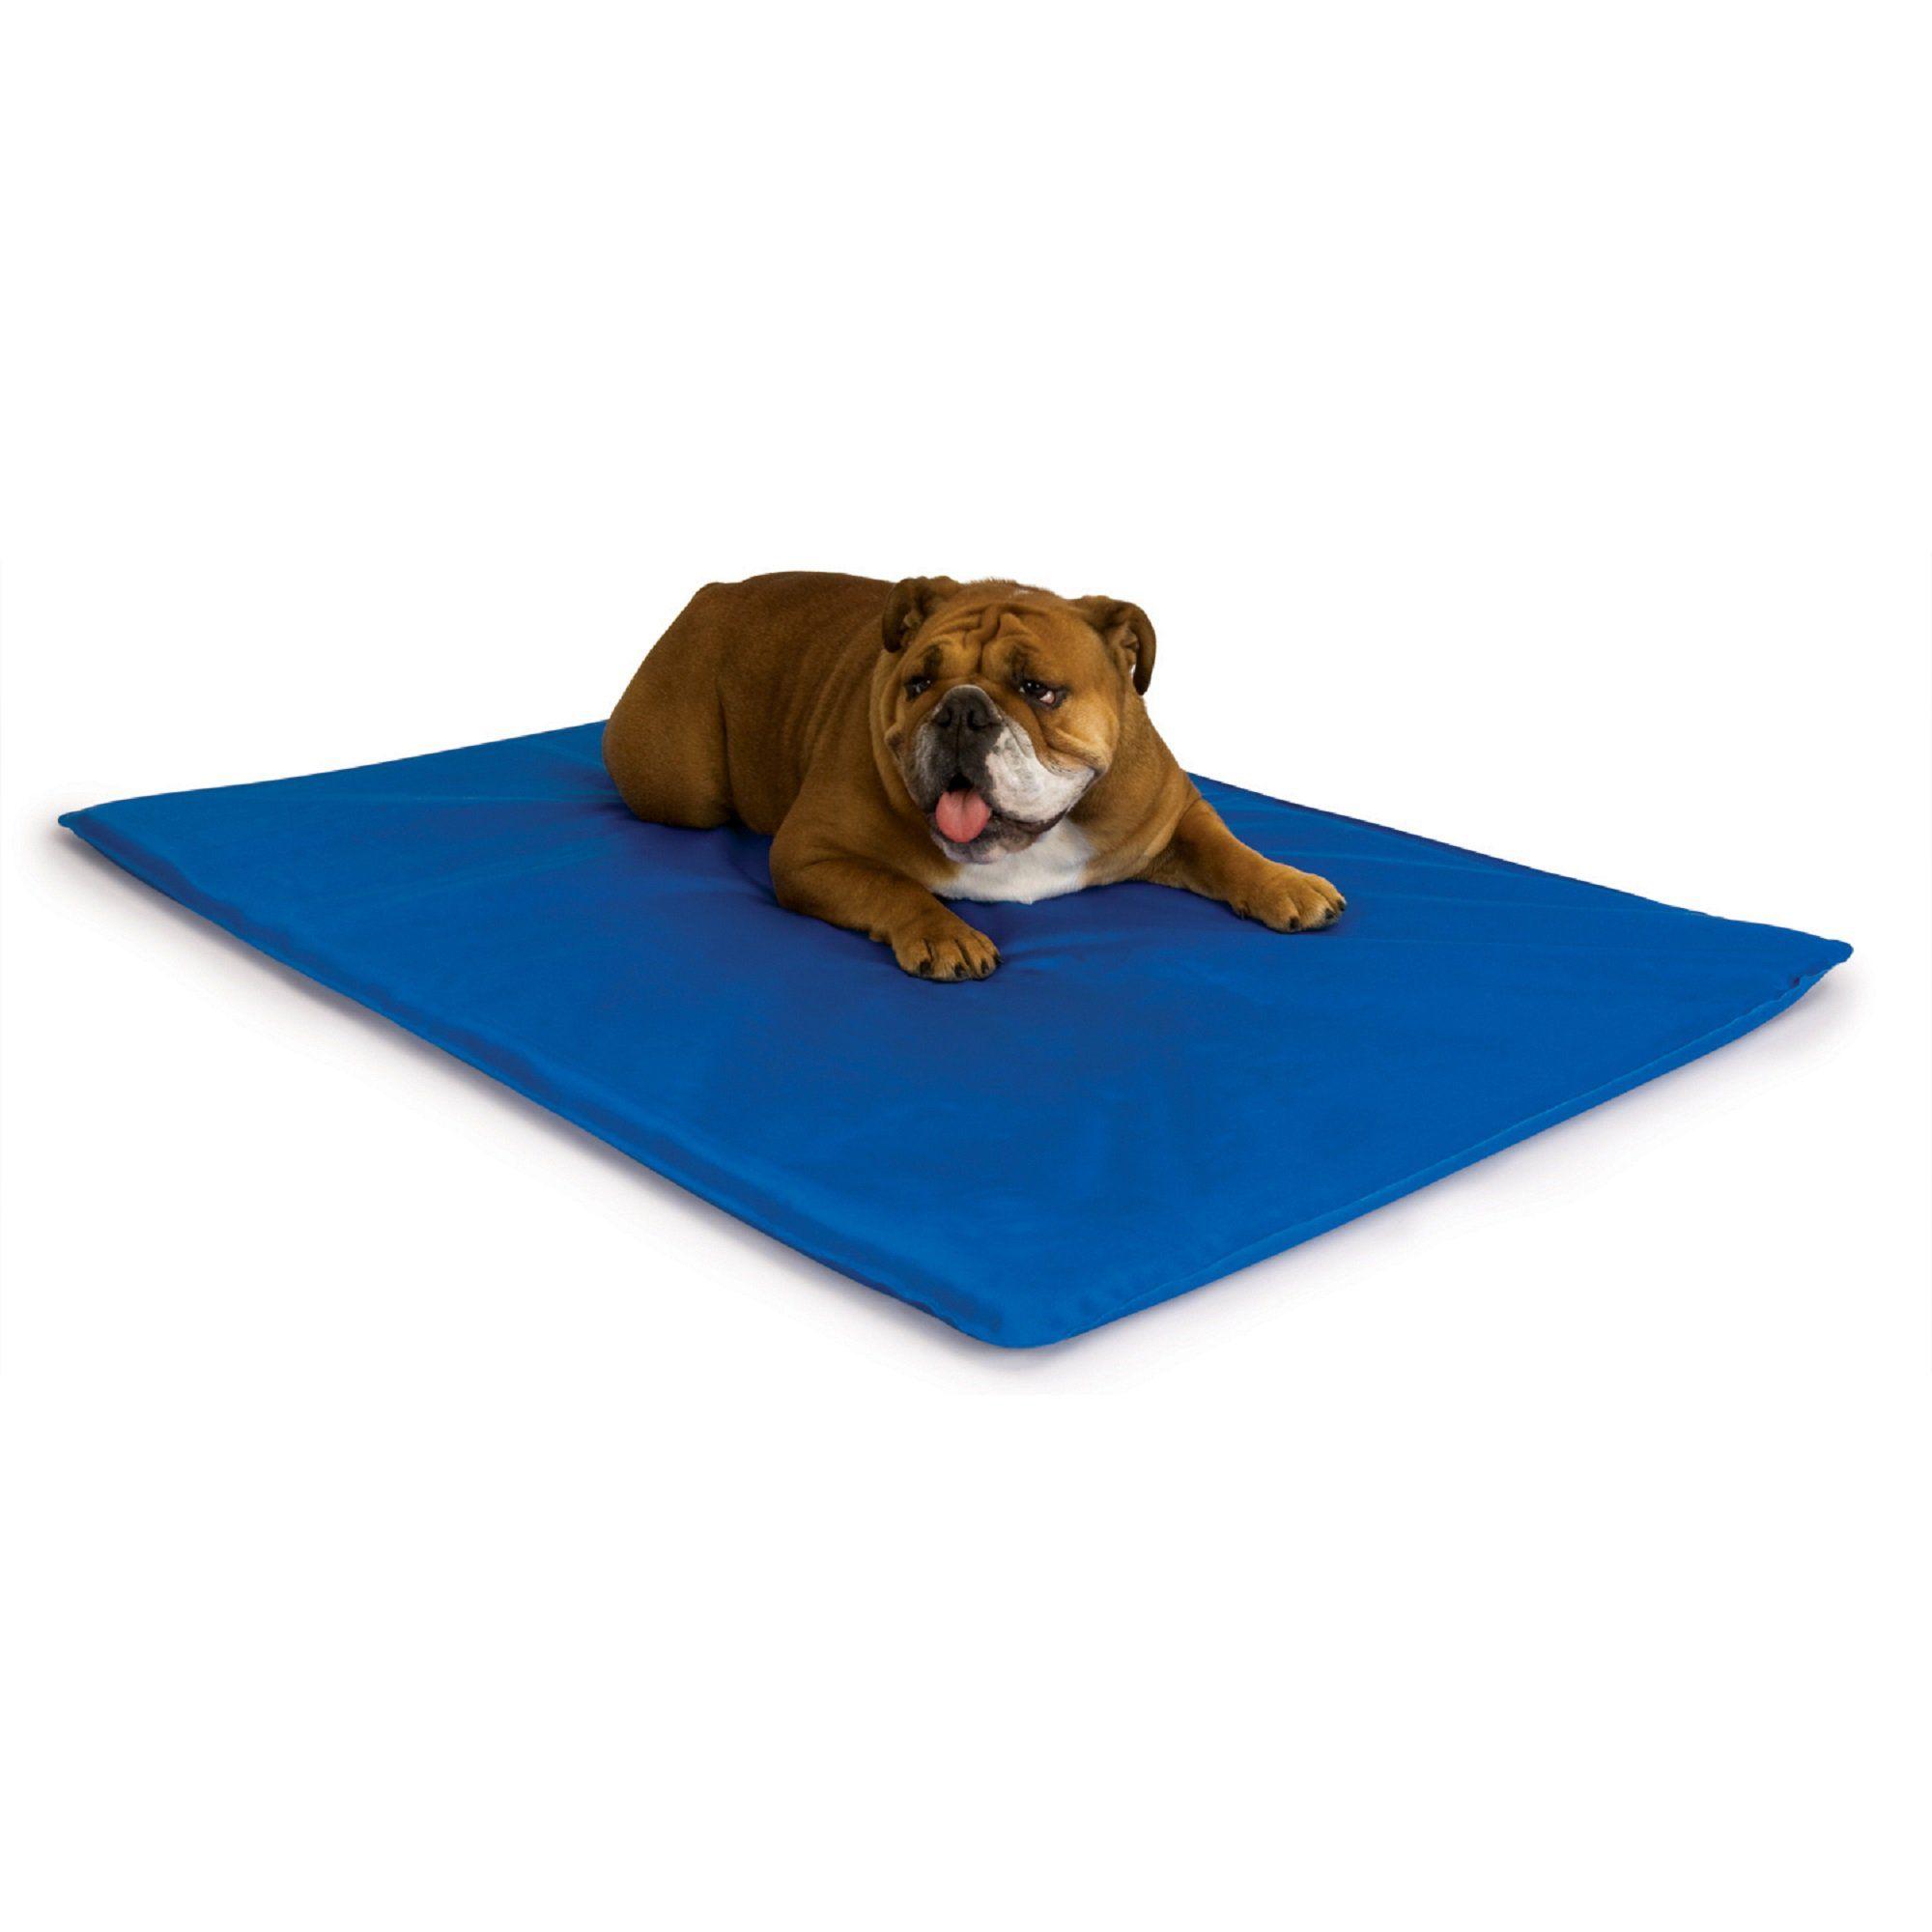 K H Cool Blue Bed Iii For Dogs 22 L X 32 W Cool Dog Beds